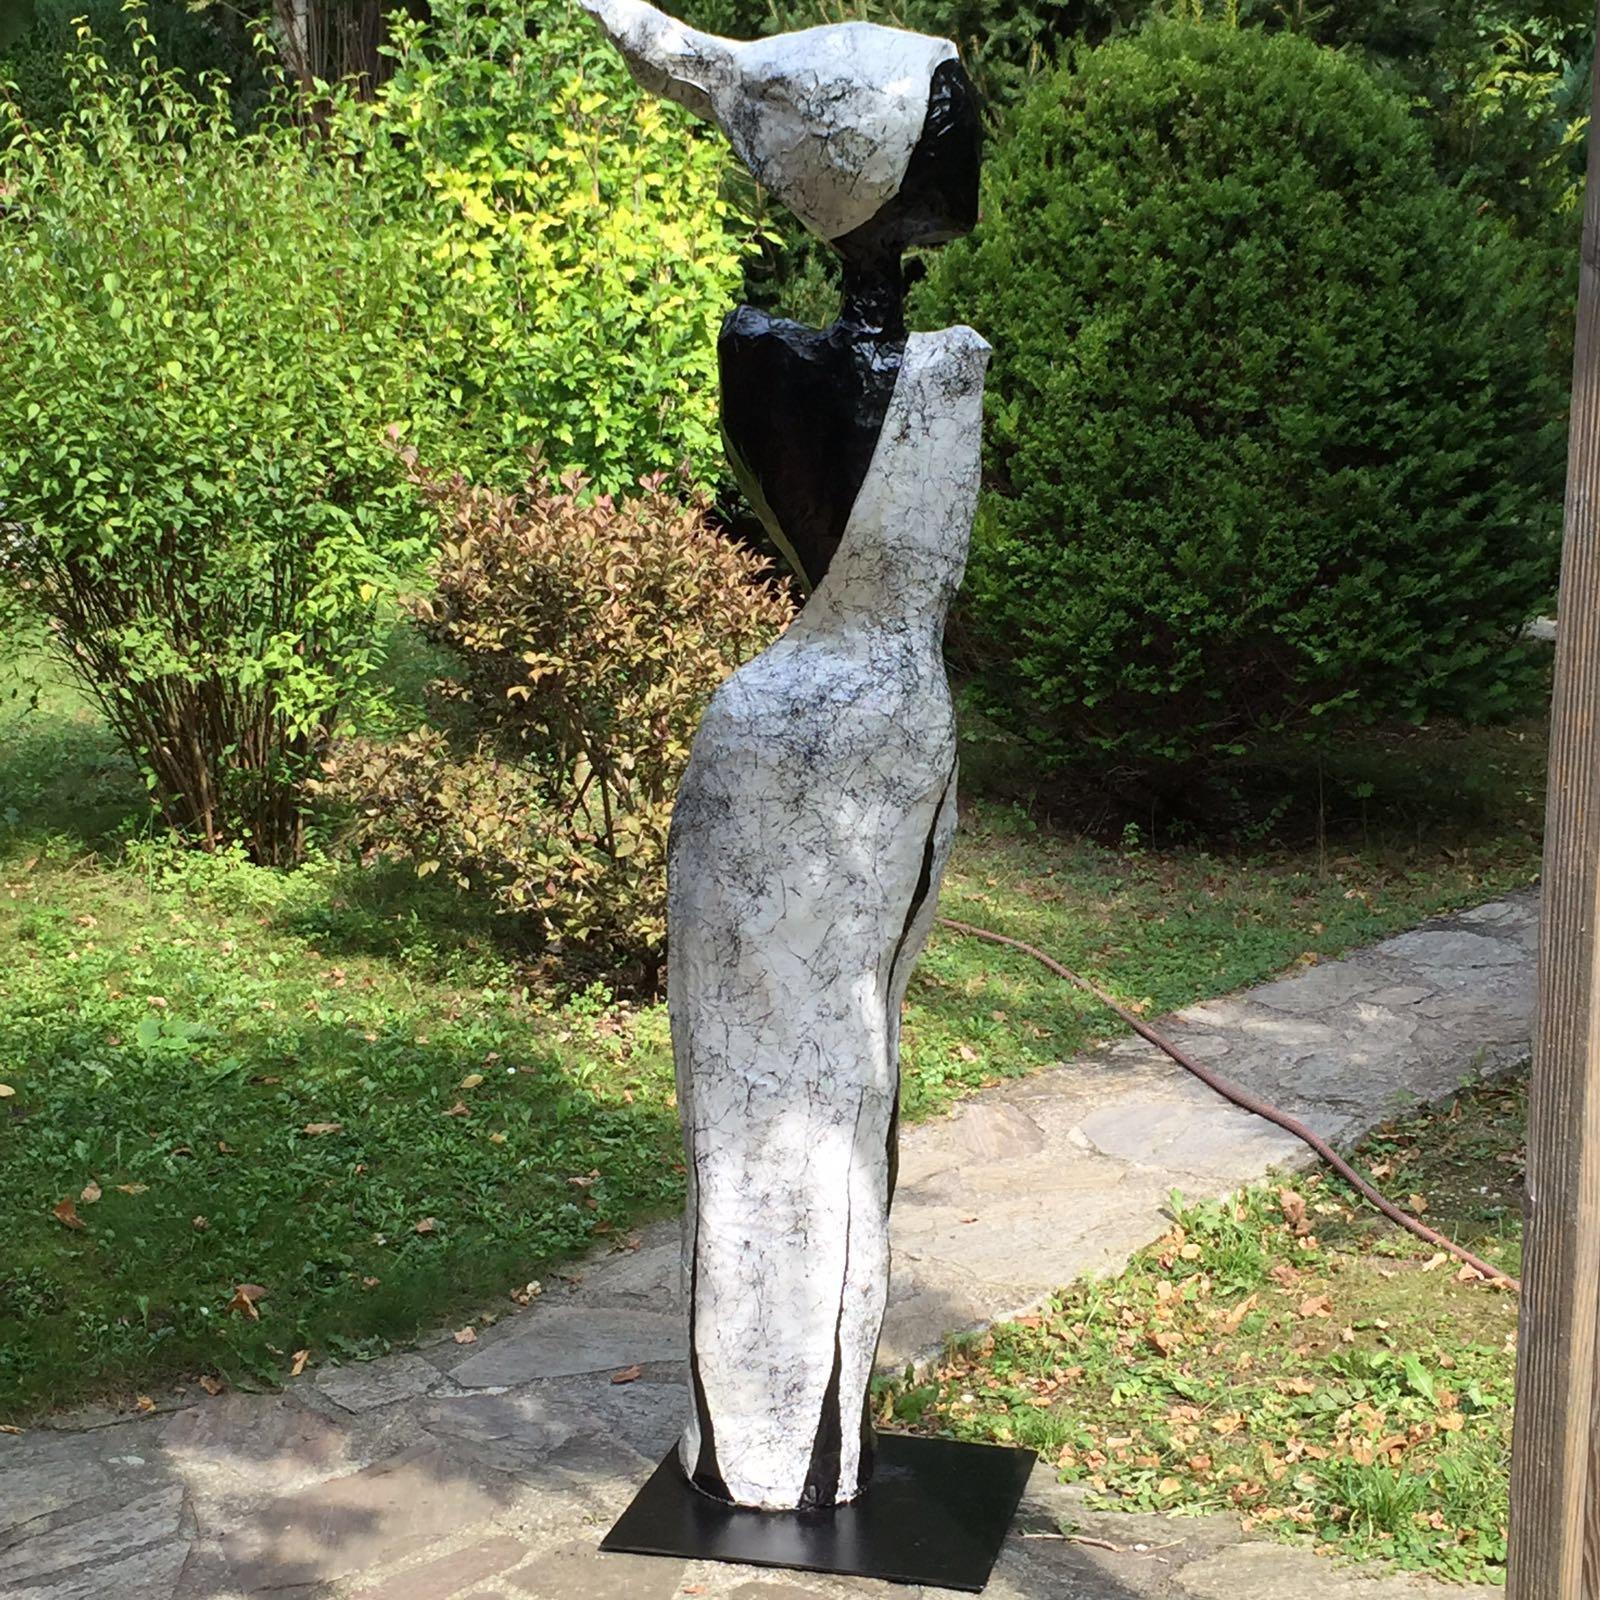 Full Size of Gartenskulpturen Aus Stein Holz Steinguss Kaufen Garten Skulptur Metall Modern Rost Schweiz Kurse Kunst Und Kreativitt Karasek Sichtschutz Wpc Stapelstühle Garten Garten Skulpturen